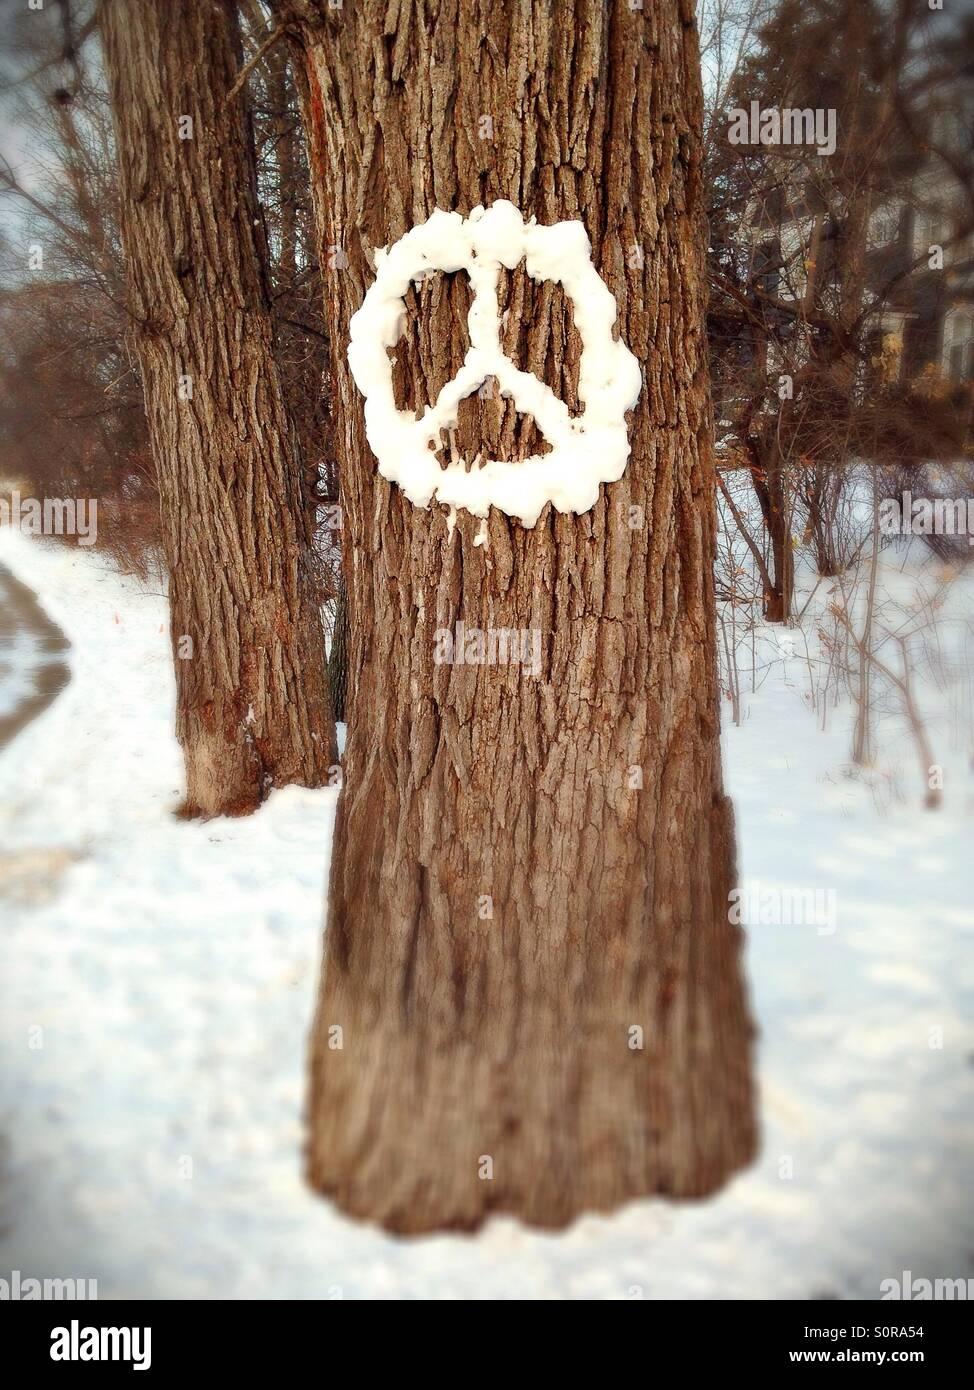 Un signo de paz hechas de nieve sobre un árbol. Imagen De Stock